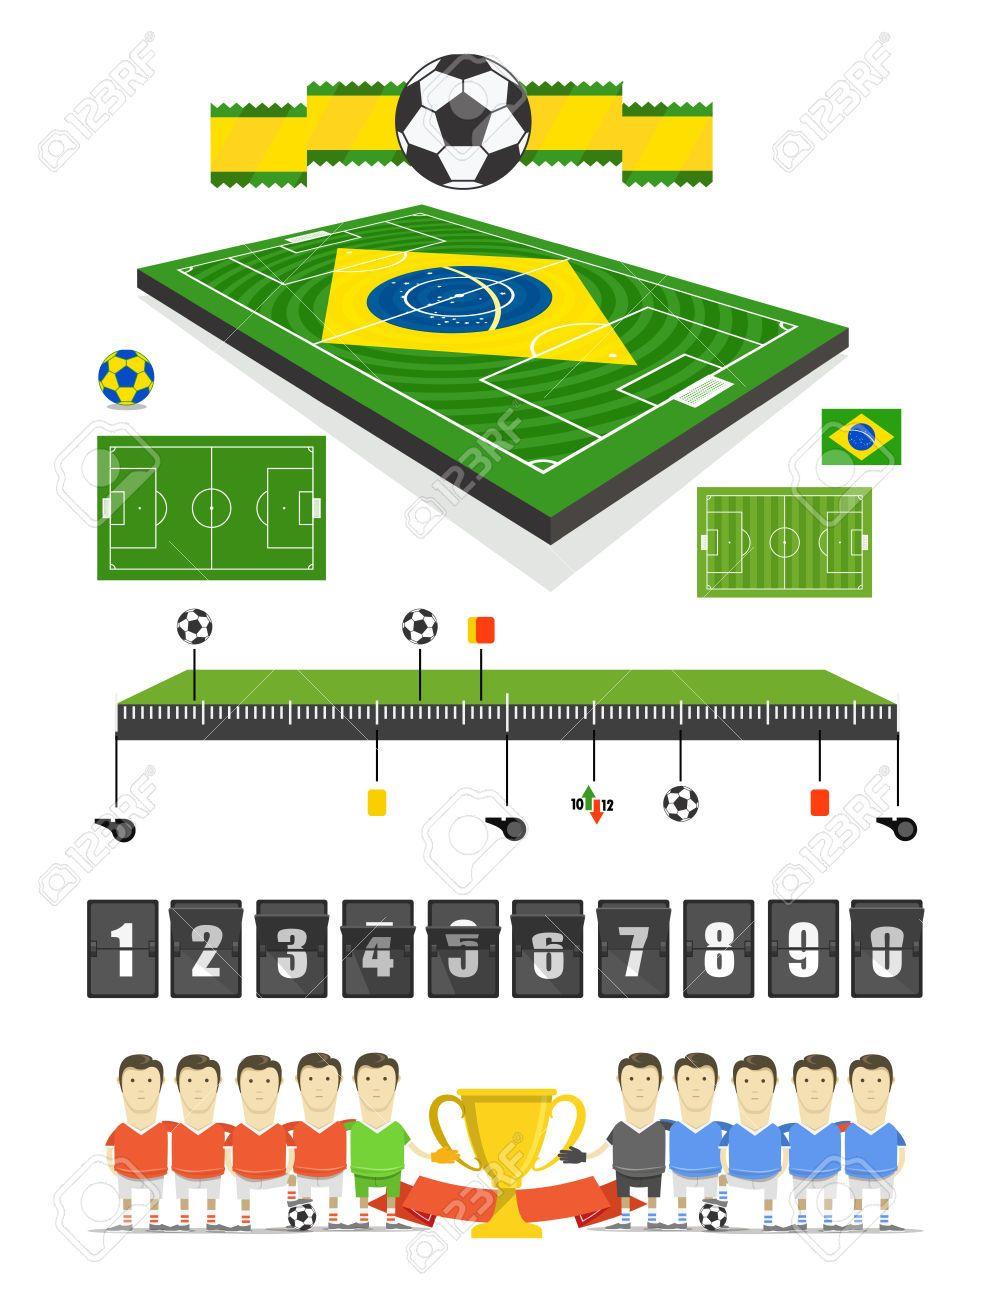 Brazil Soccer Match Infographic Elements Soccer Match Infographic Soccer